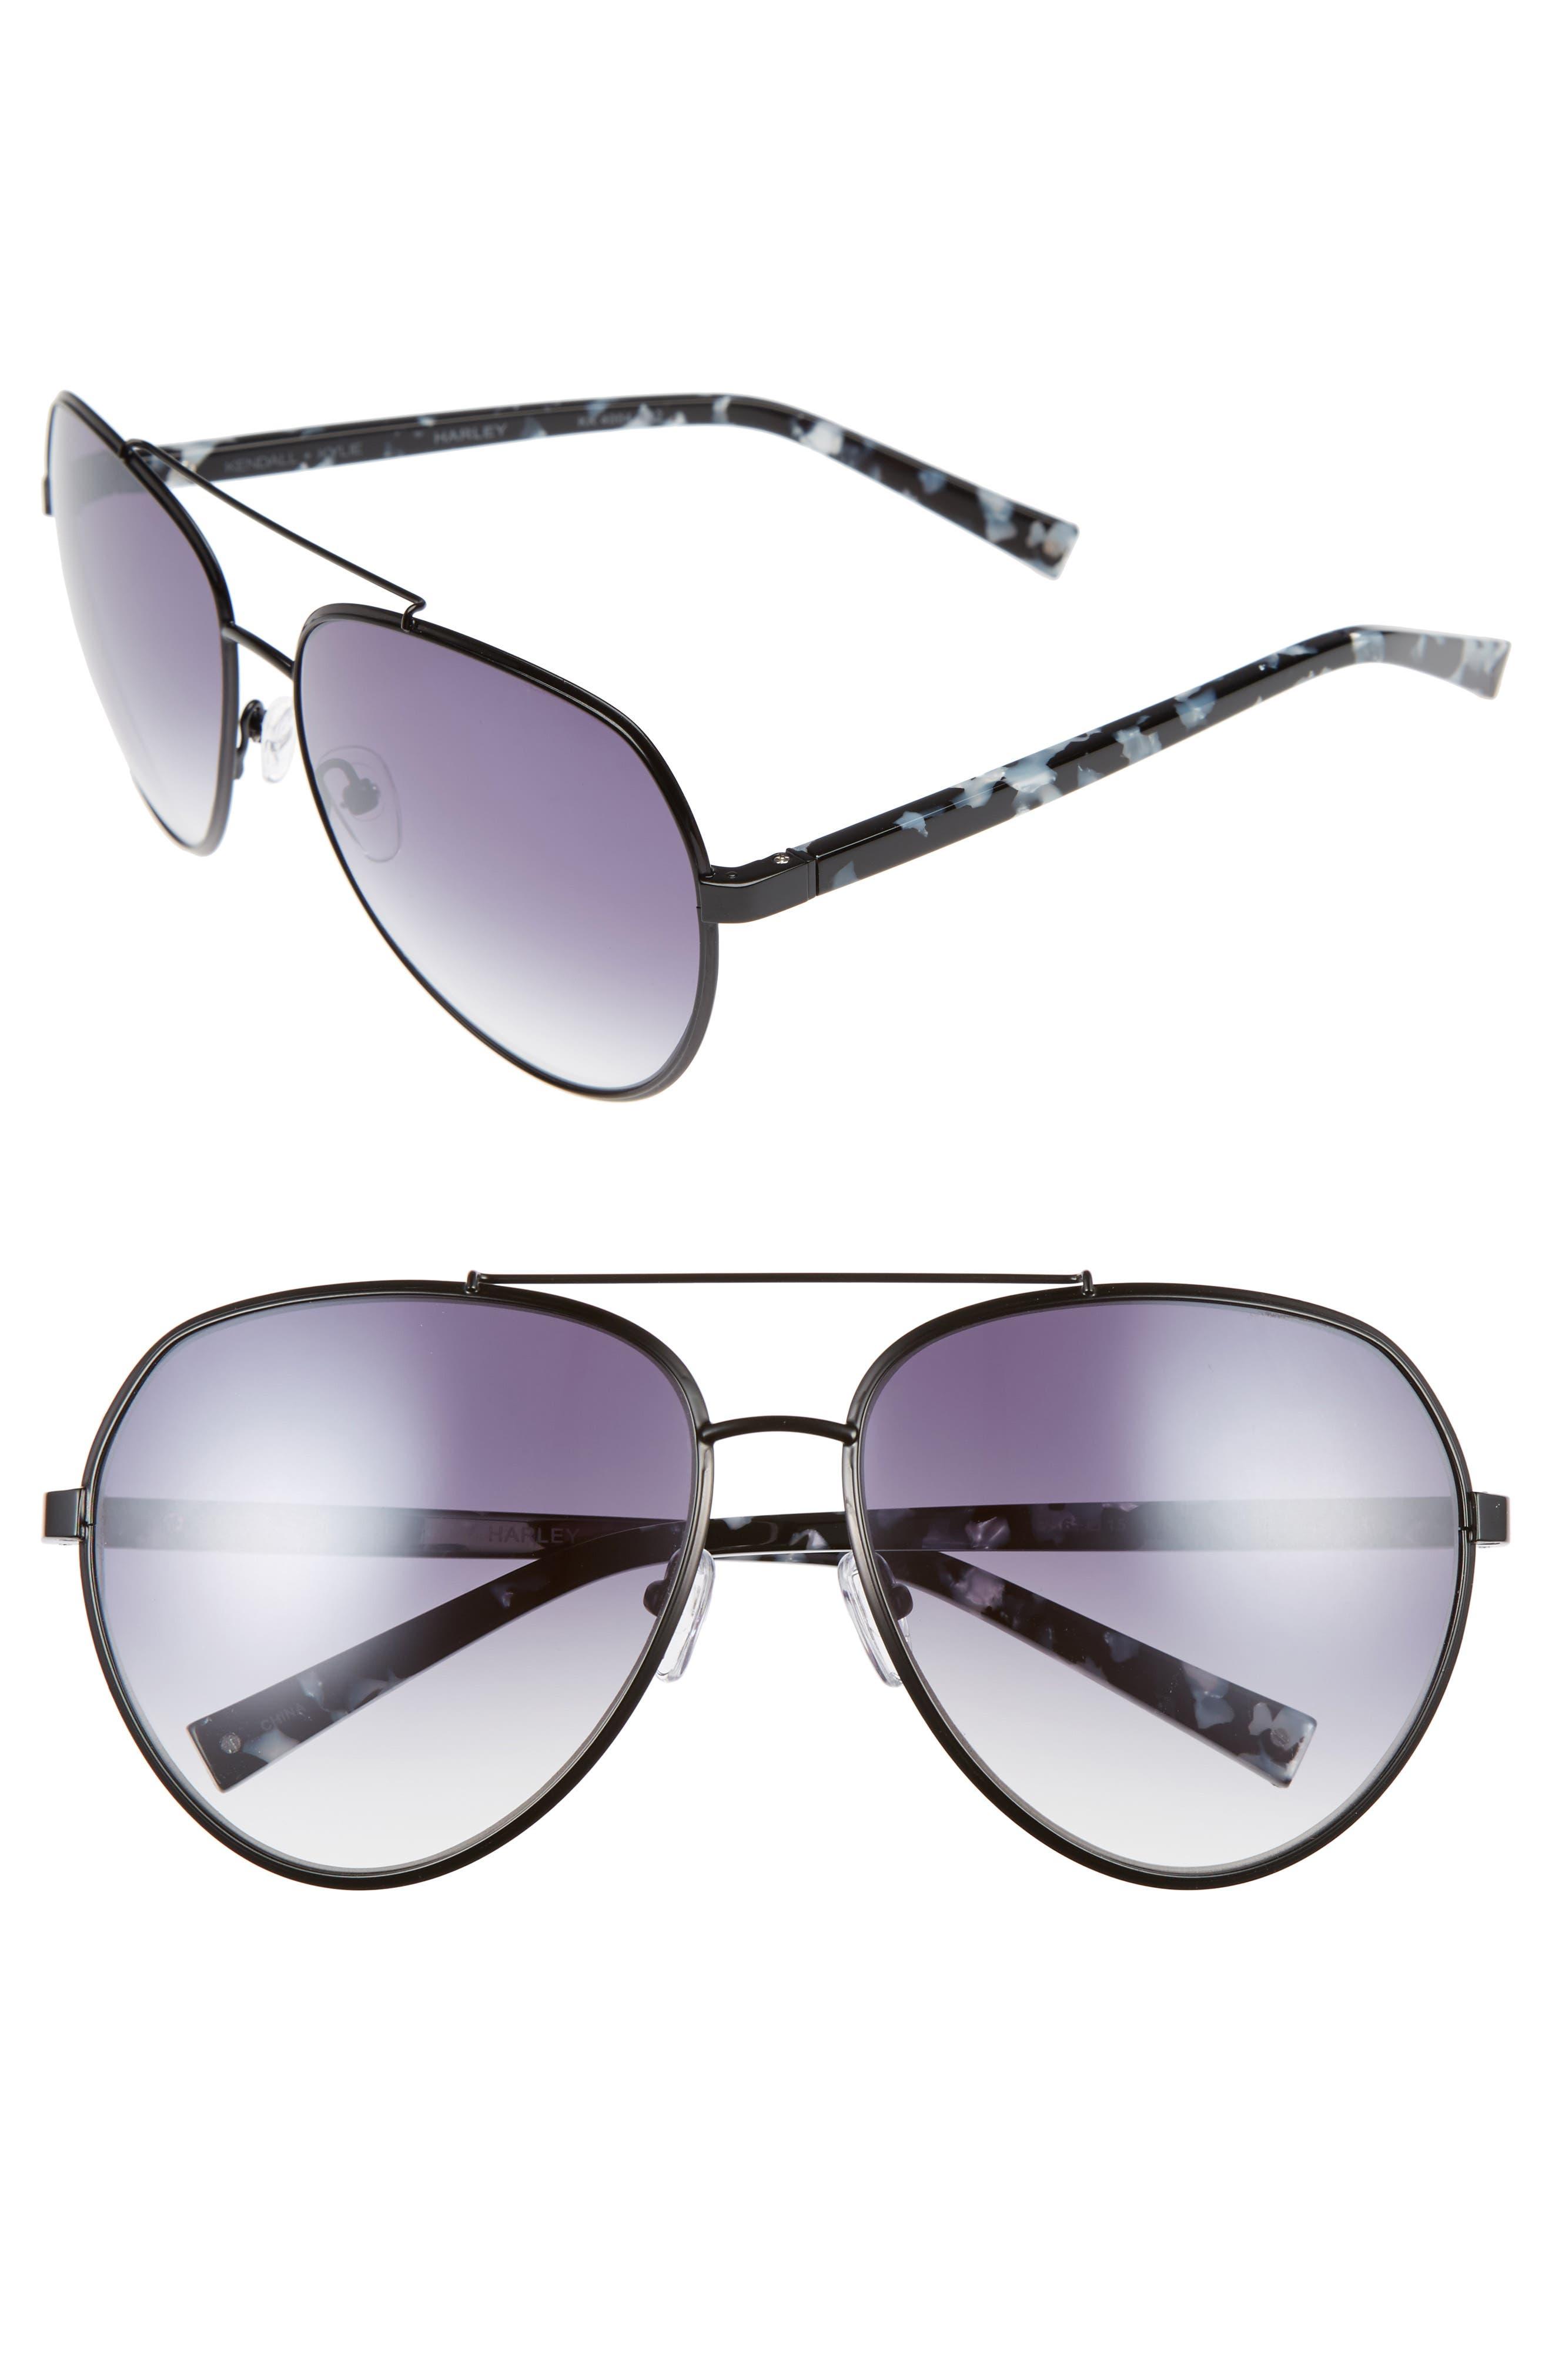 KENDALL + KYLIE 61mm Aviator Sunglasses